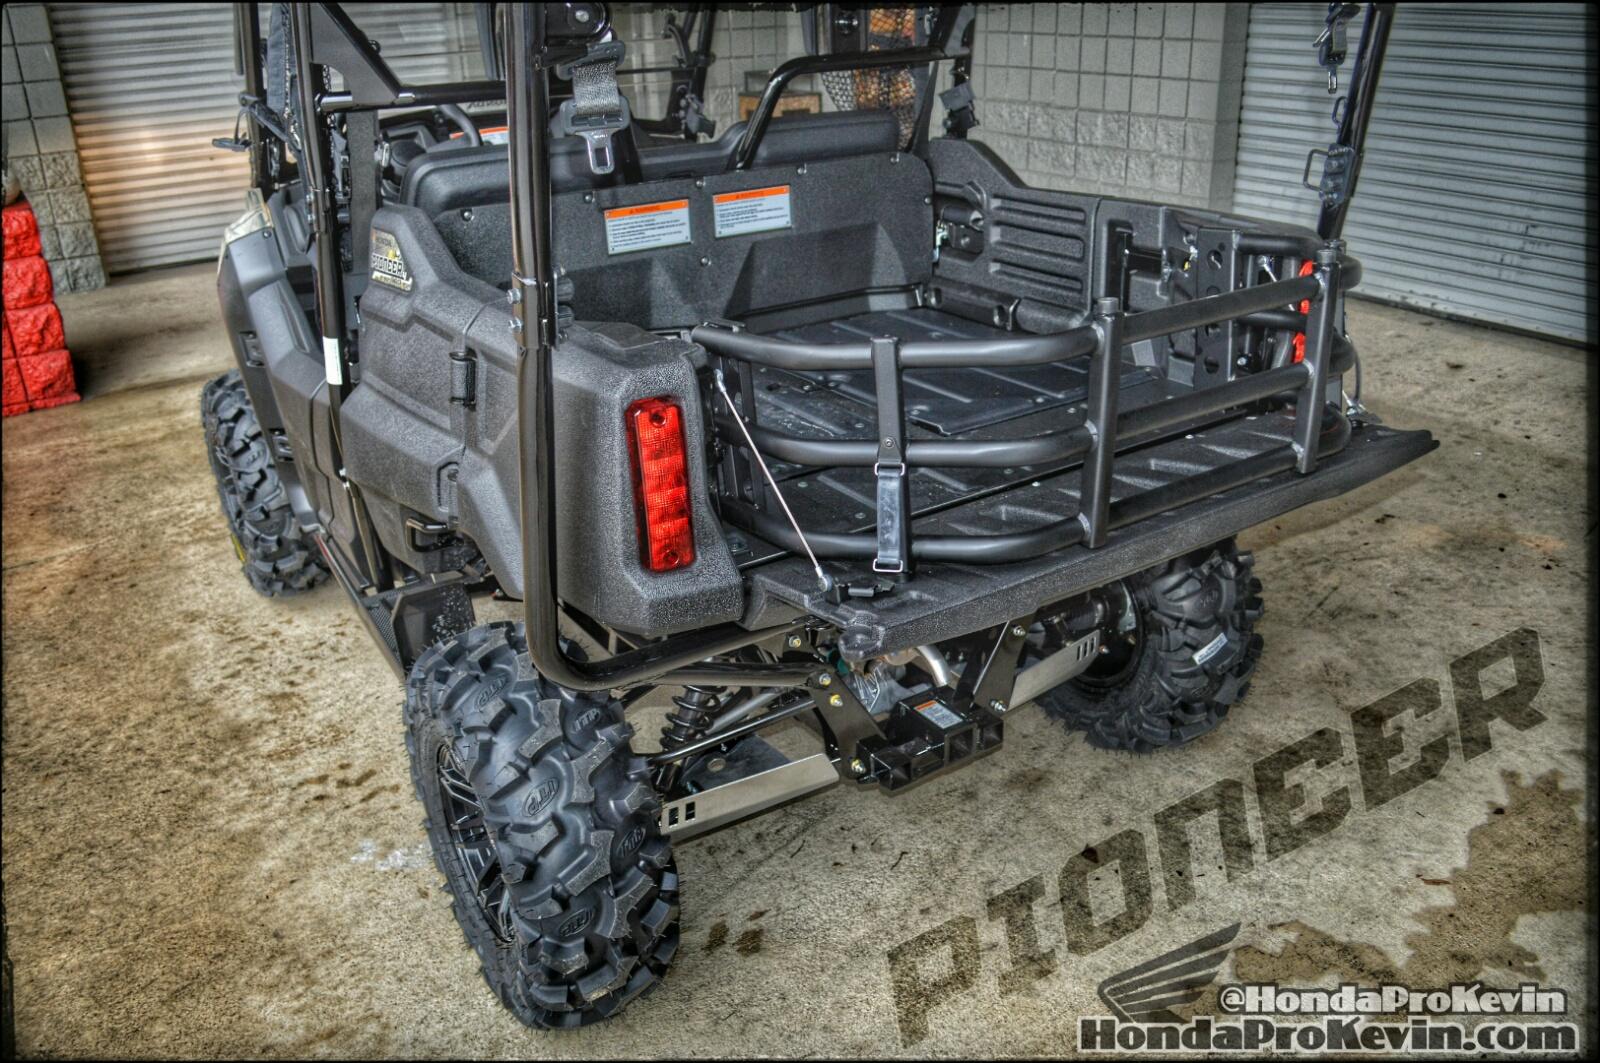 2016 Honda Pioneer 700 ITP Tires & Wheels - SxS - UTV - Side by Side ATV Accessories SXS700